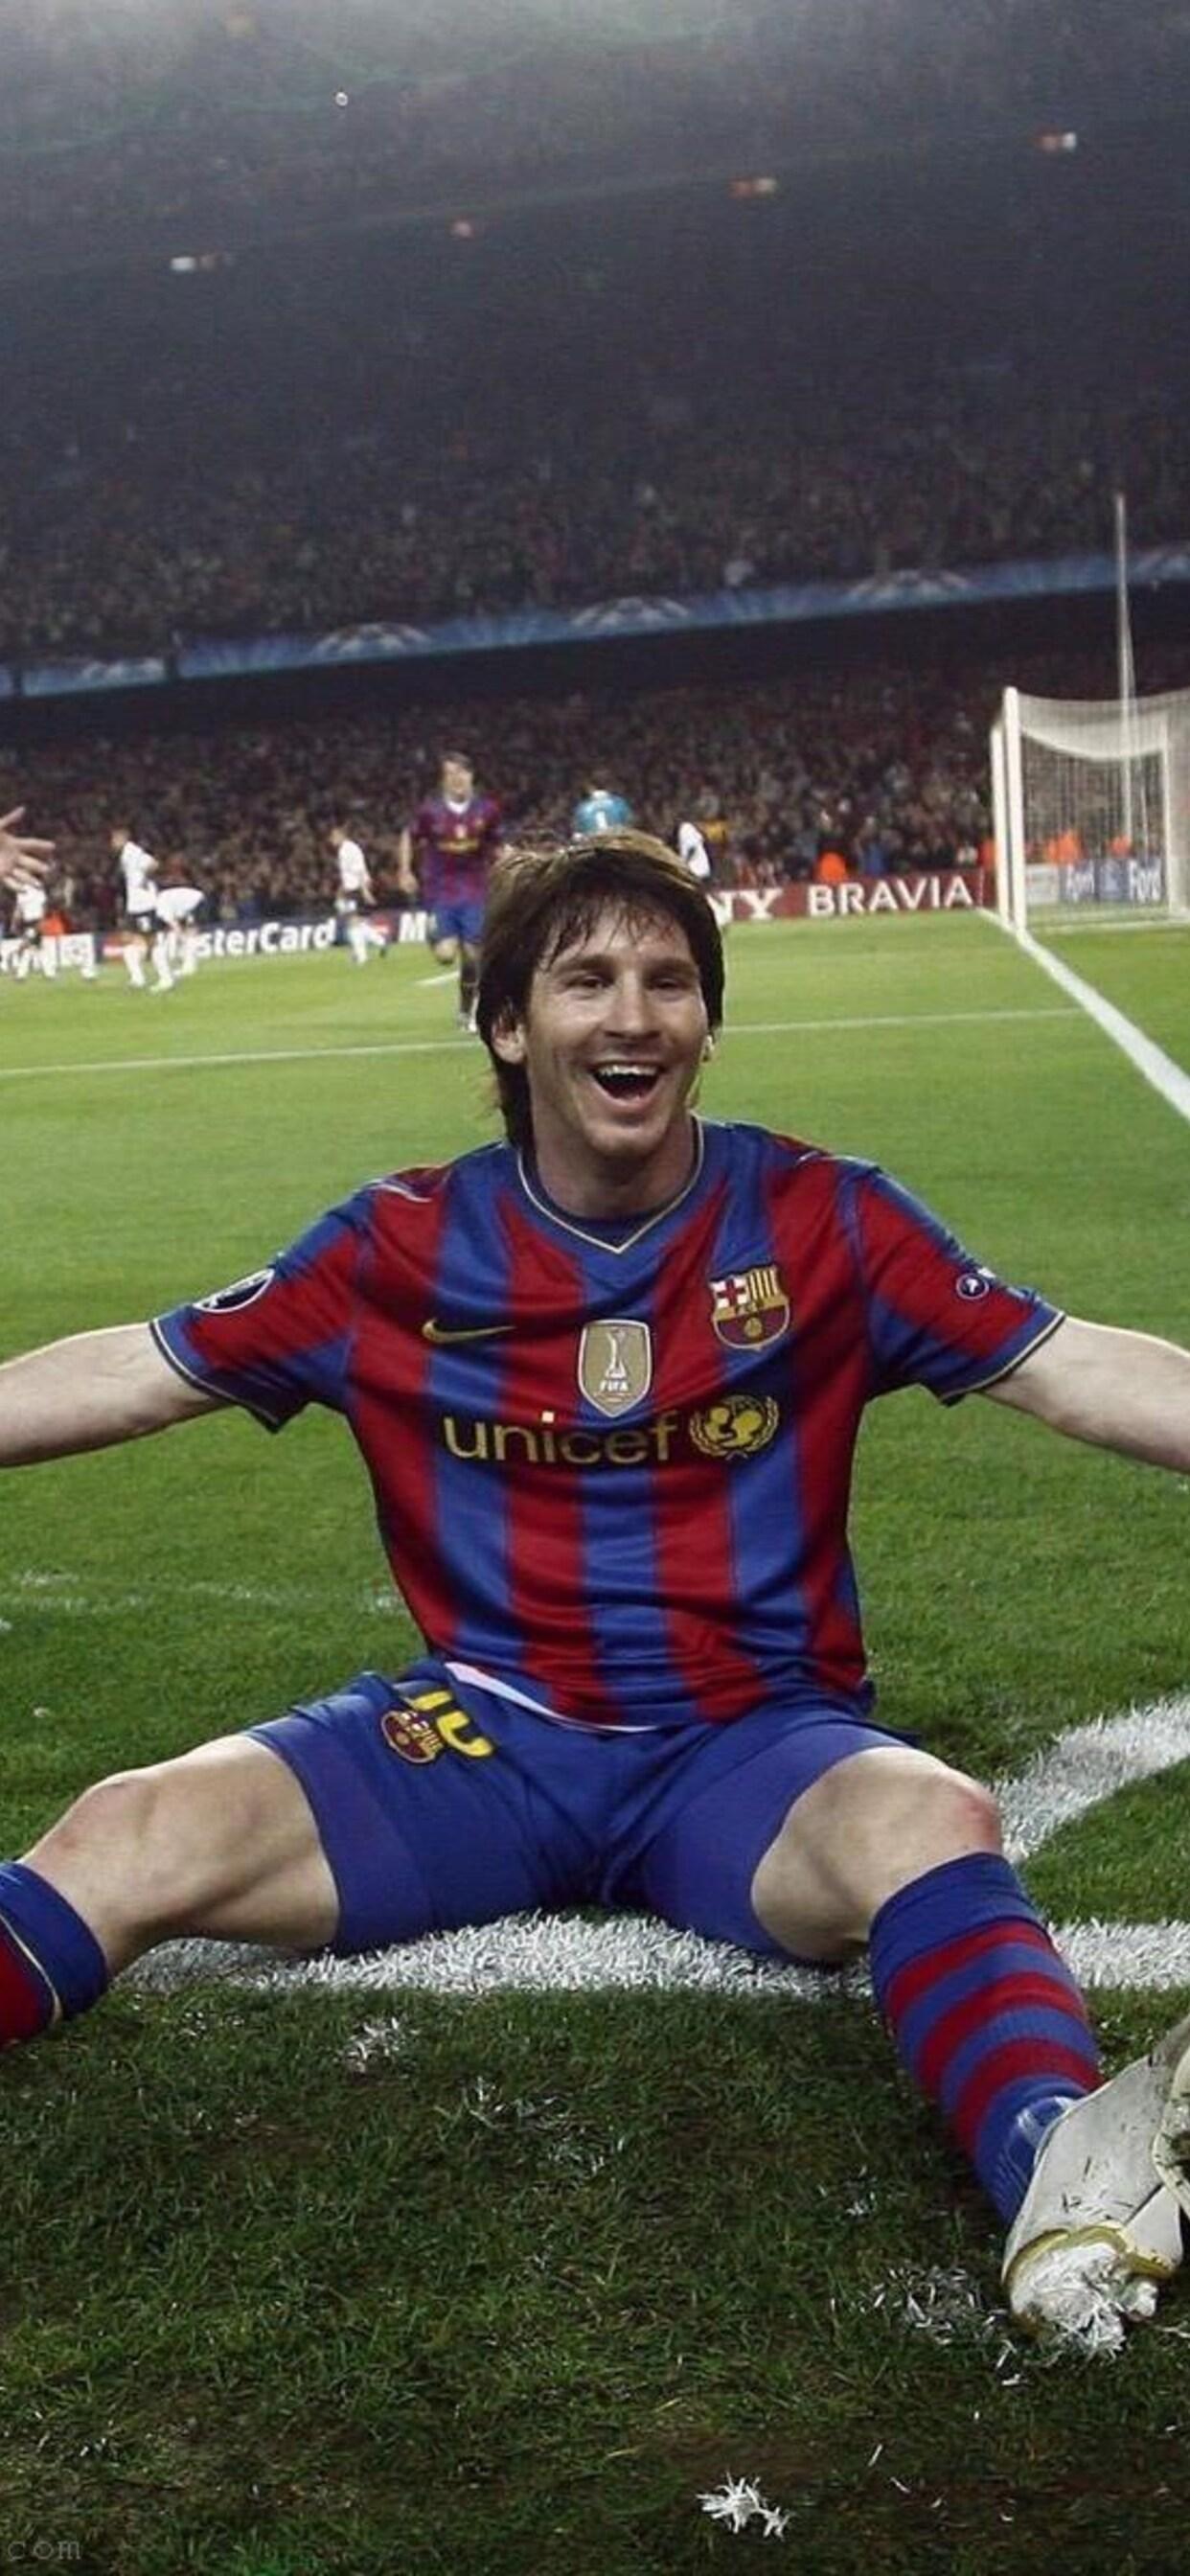 1242x2688 Fcb Leo Messi Iphone Xs Max Hd 4k Wallpapers Images